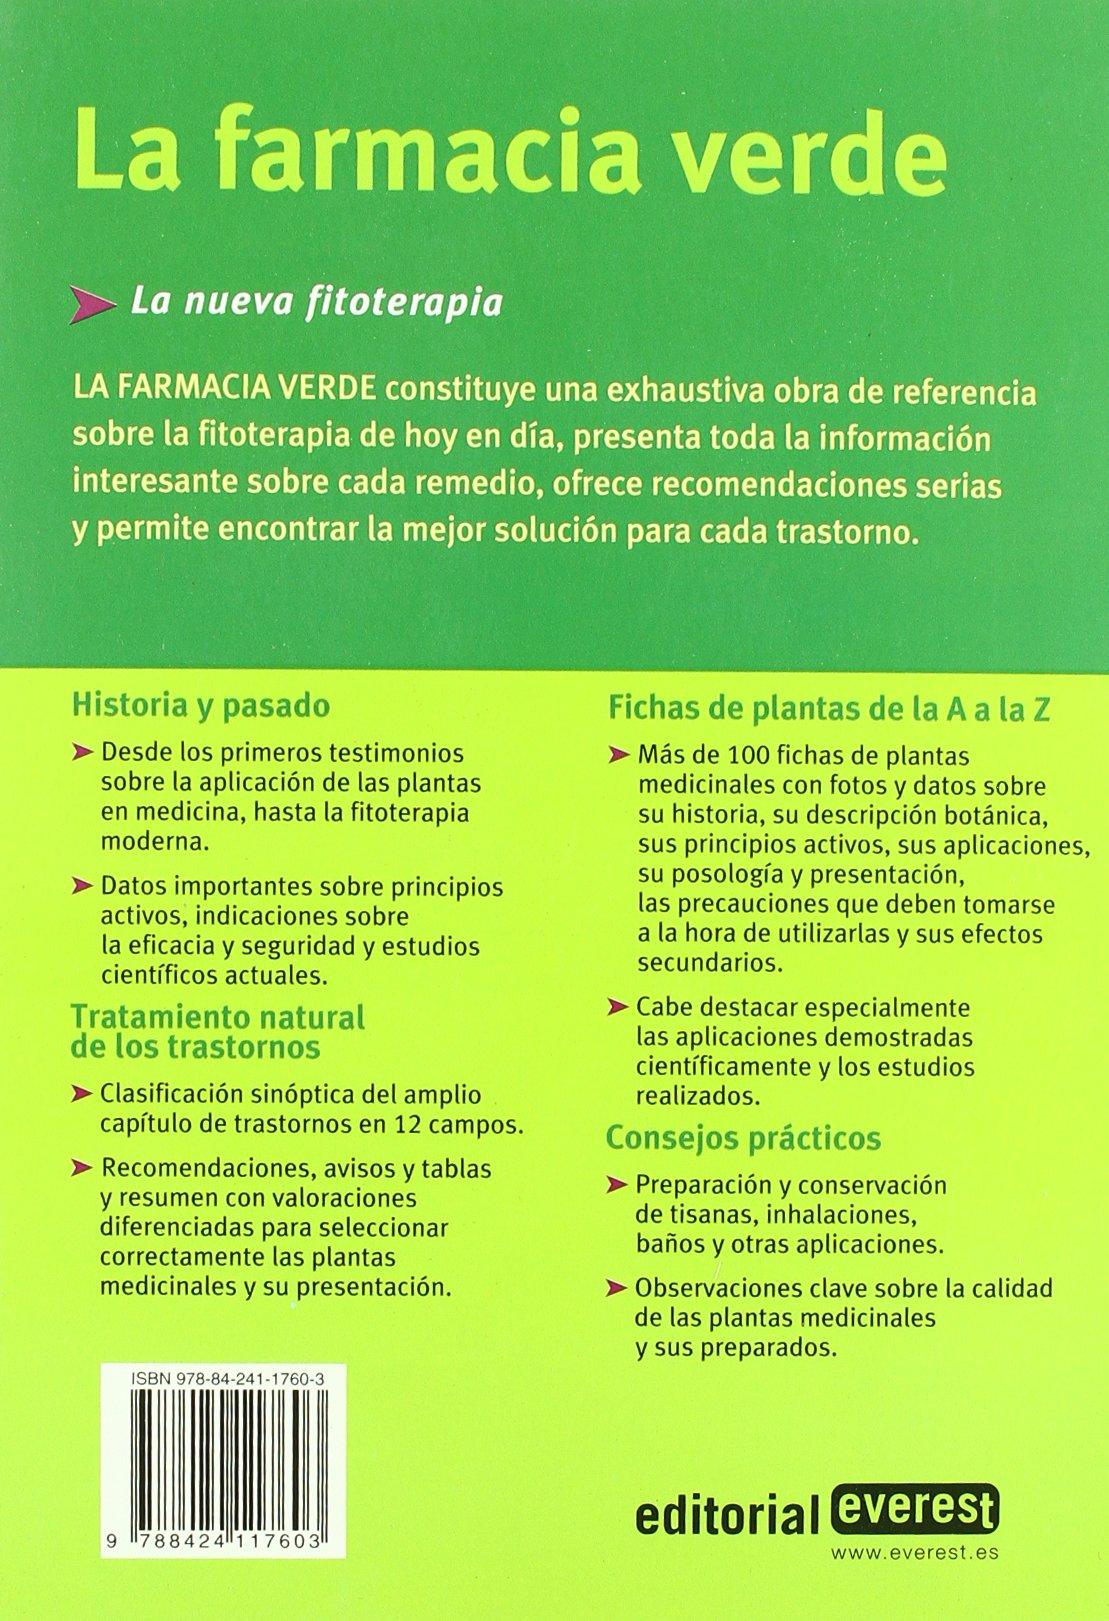 La Farmacia Verde Spanish Edition Varios 9788424117603 Amazon